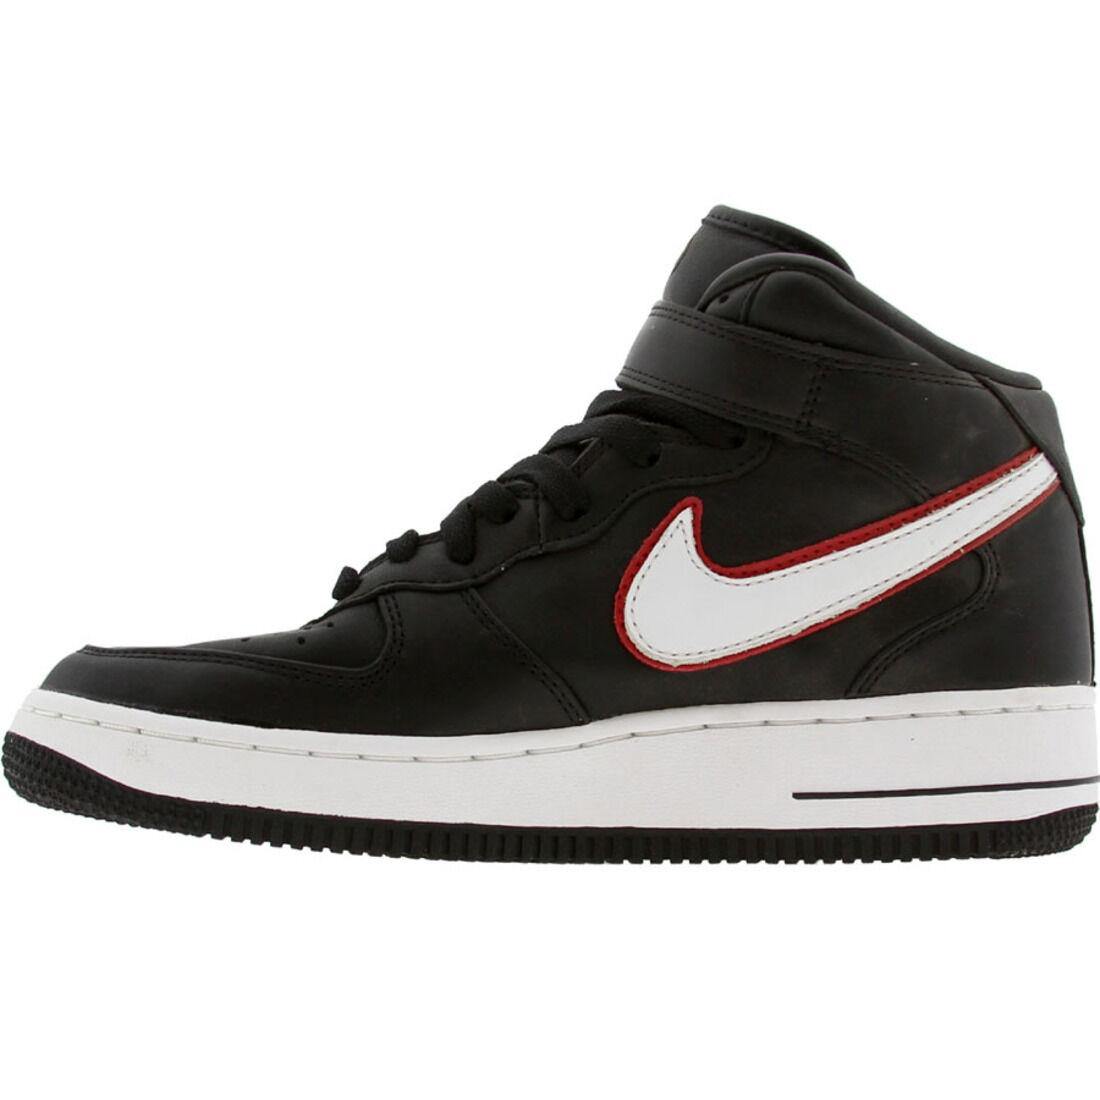 309062-011 Nike Air Force 1 Mid Mid Mid LTD (Michael Vick Edition) 5568a3